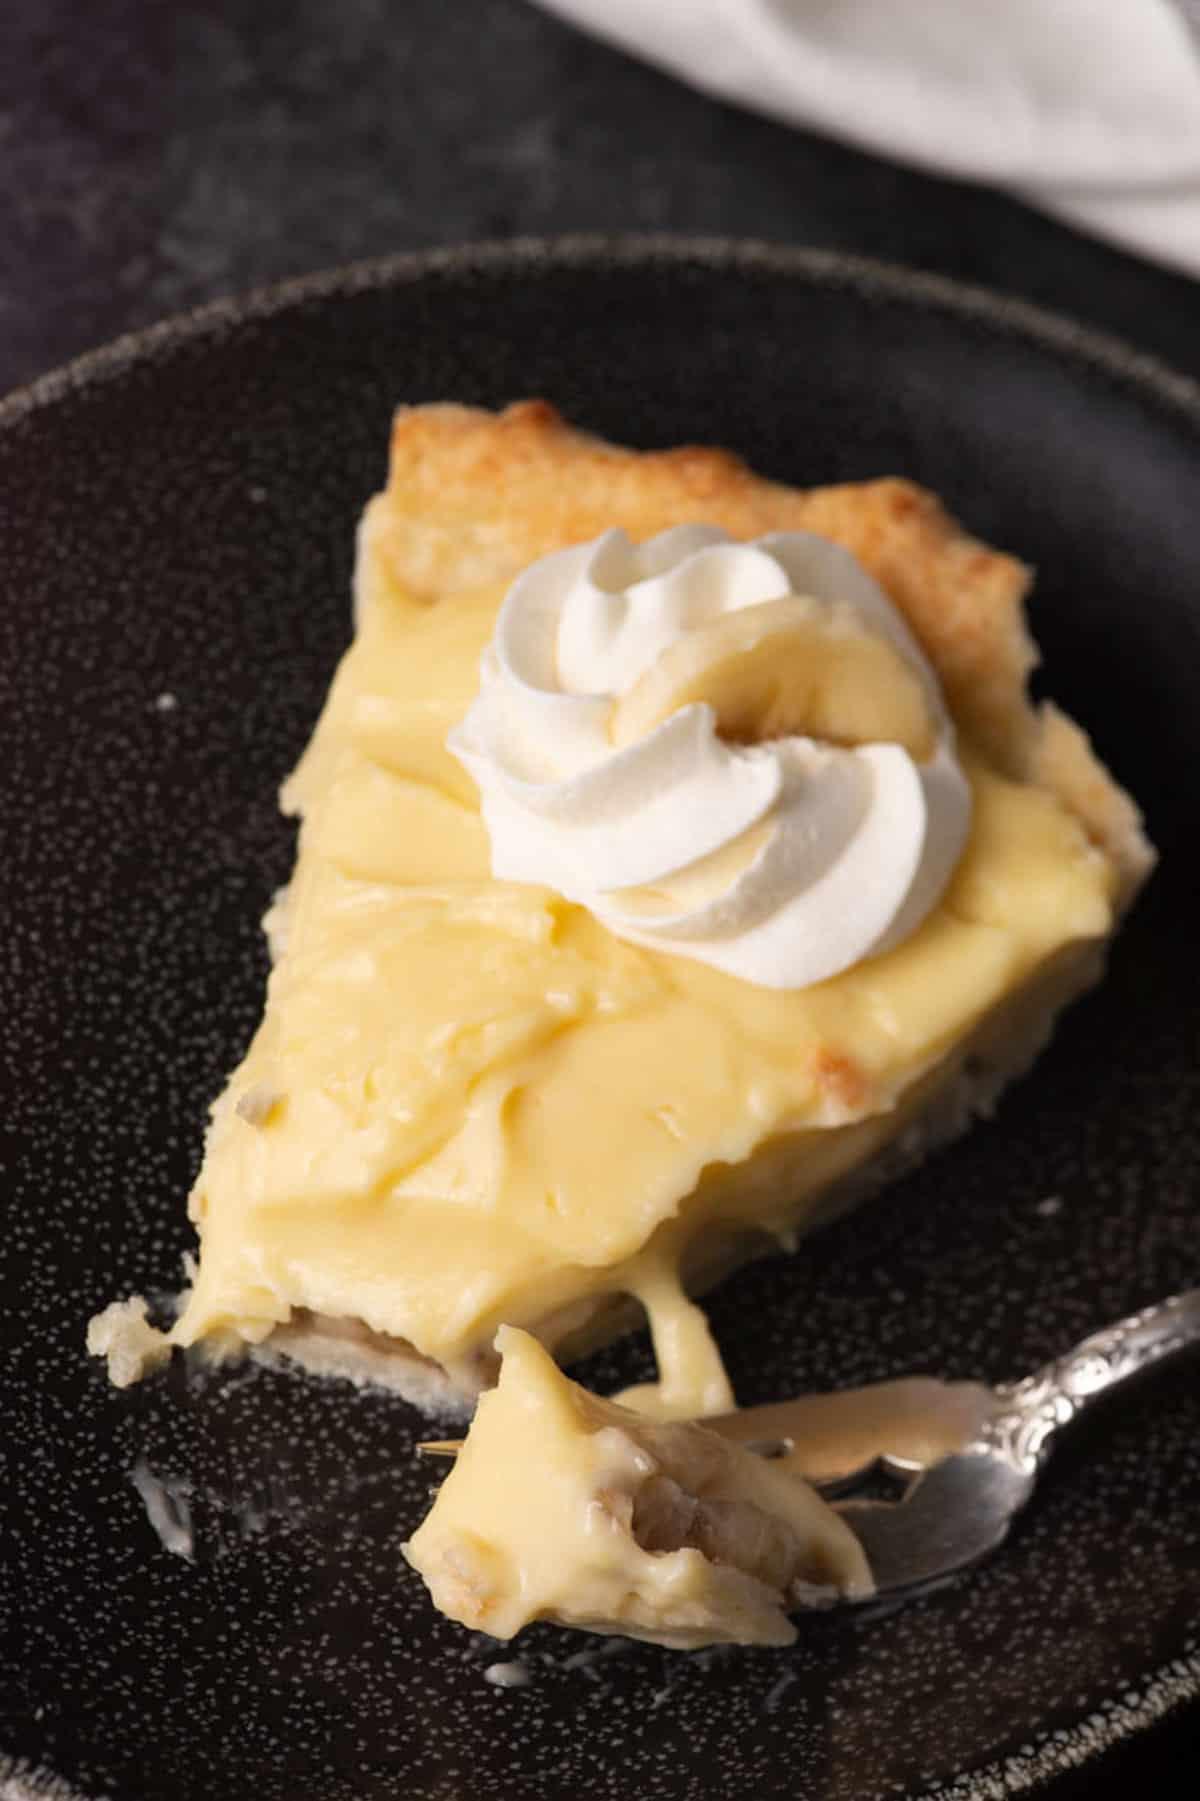 A bite of banana cream pie on a black plate.